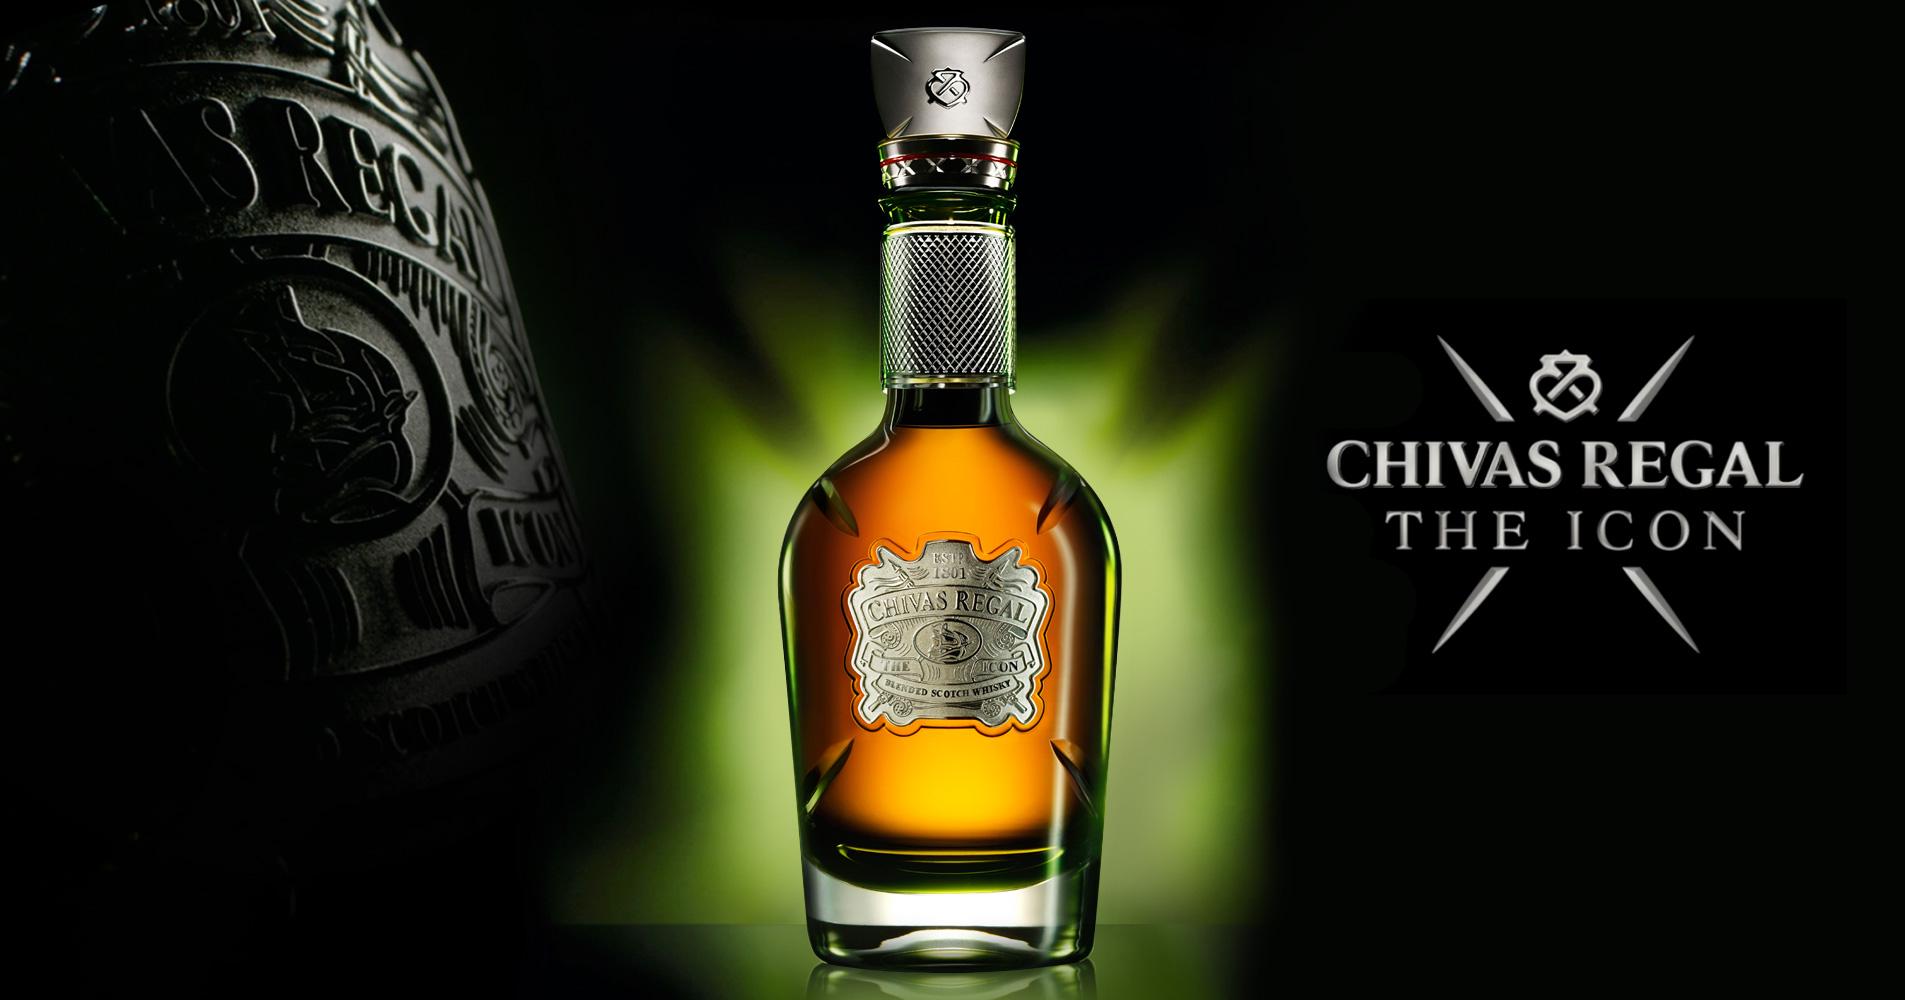 Chivas Regal The Icon The Whisky Exchange